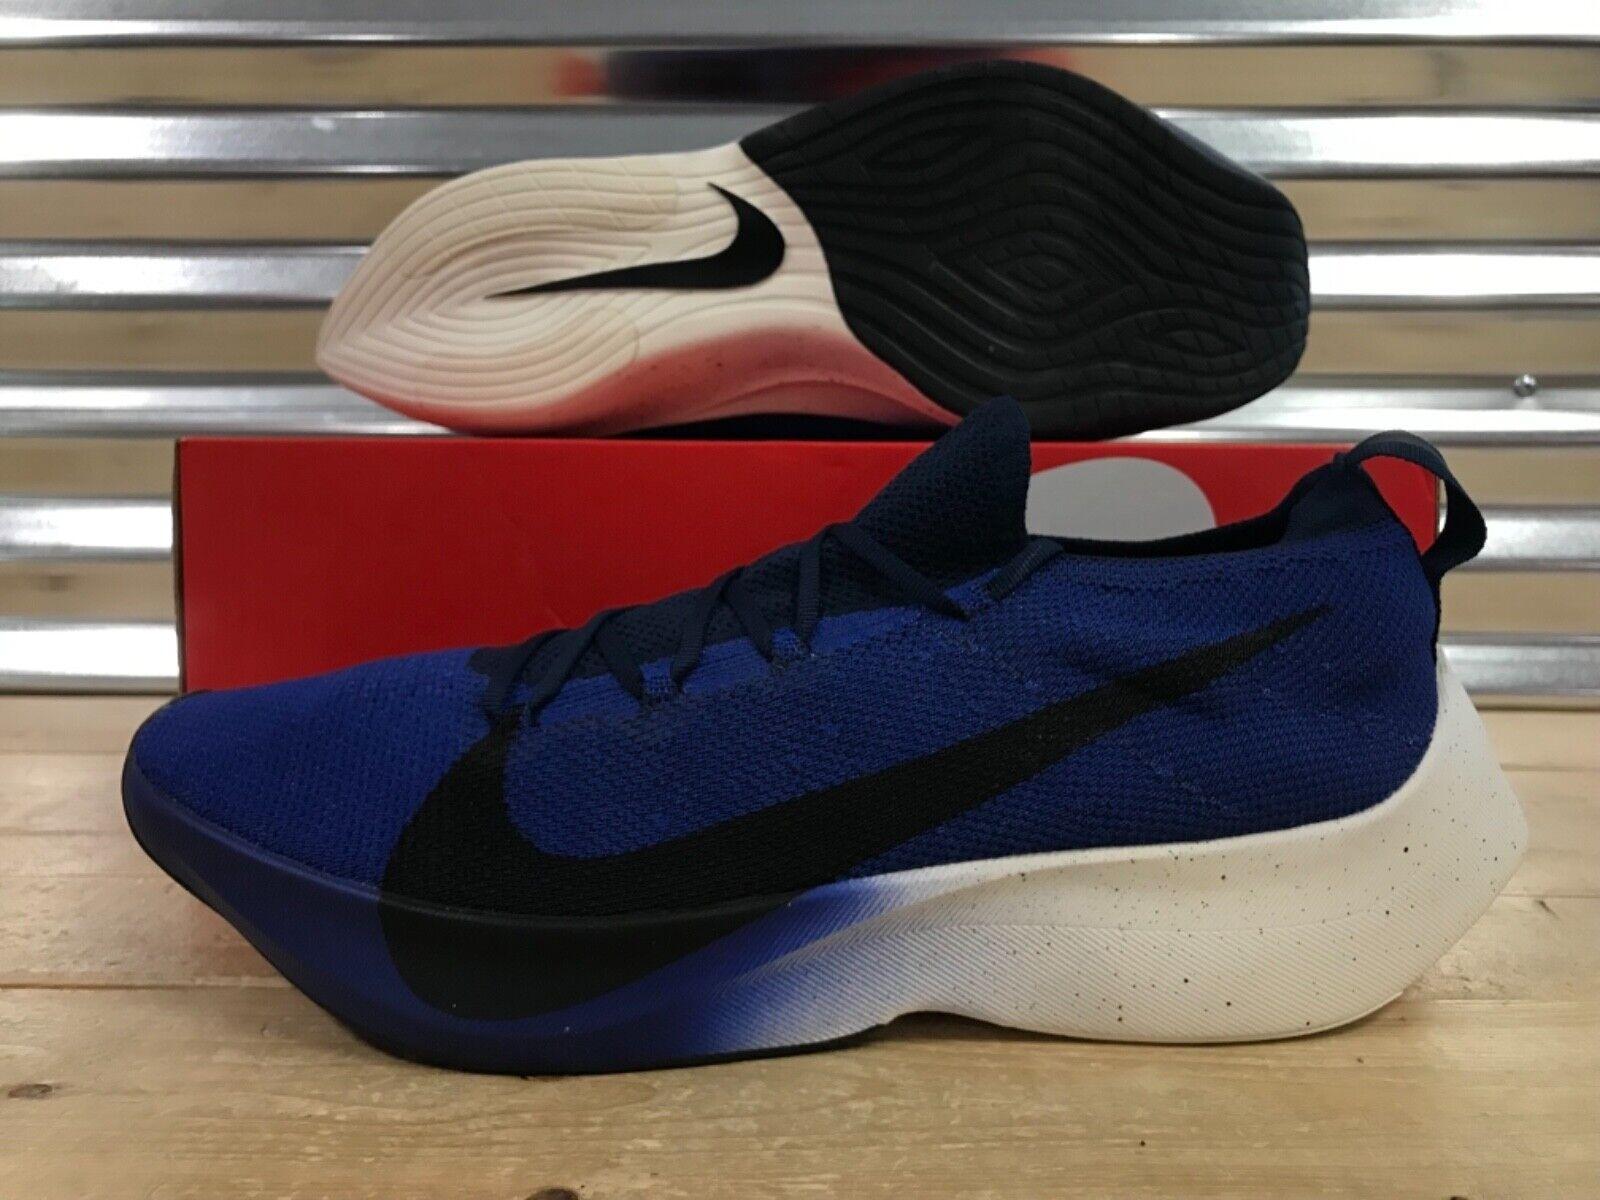 Nike Vapor Street Flyknit Running scarpe scarpe scarpe Deep Royal blu Navy SZ 14 (AQ1763-400) 1fc4bb